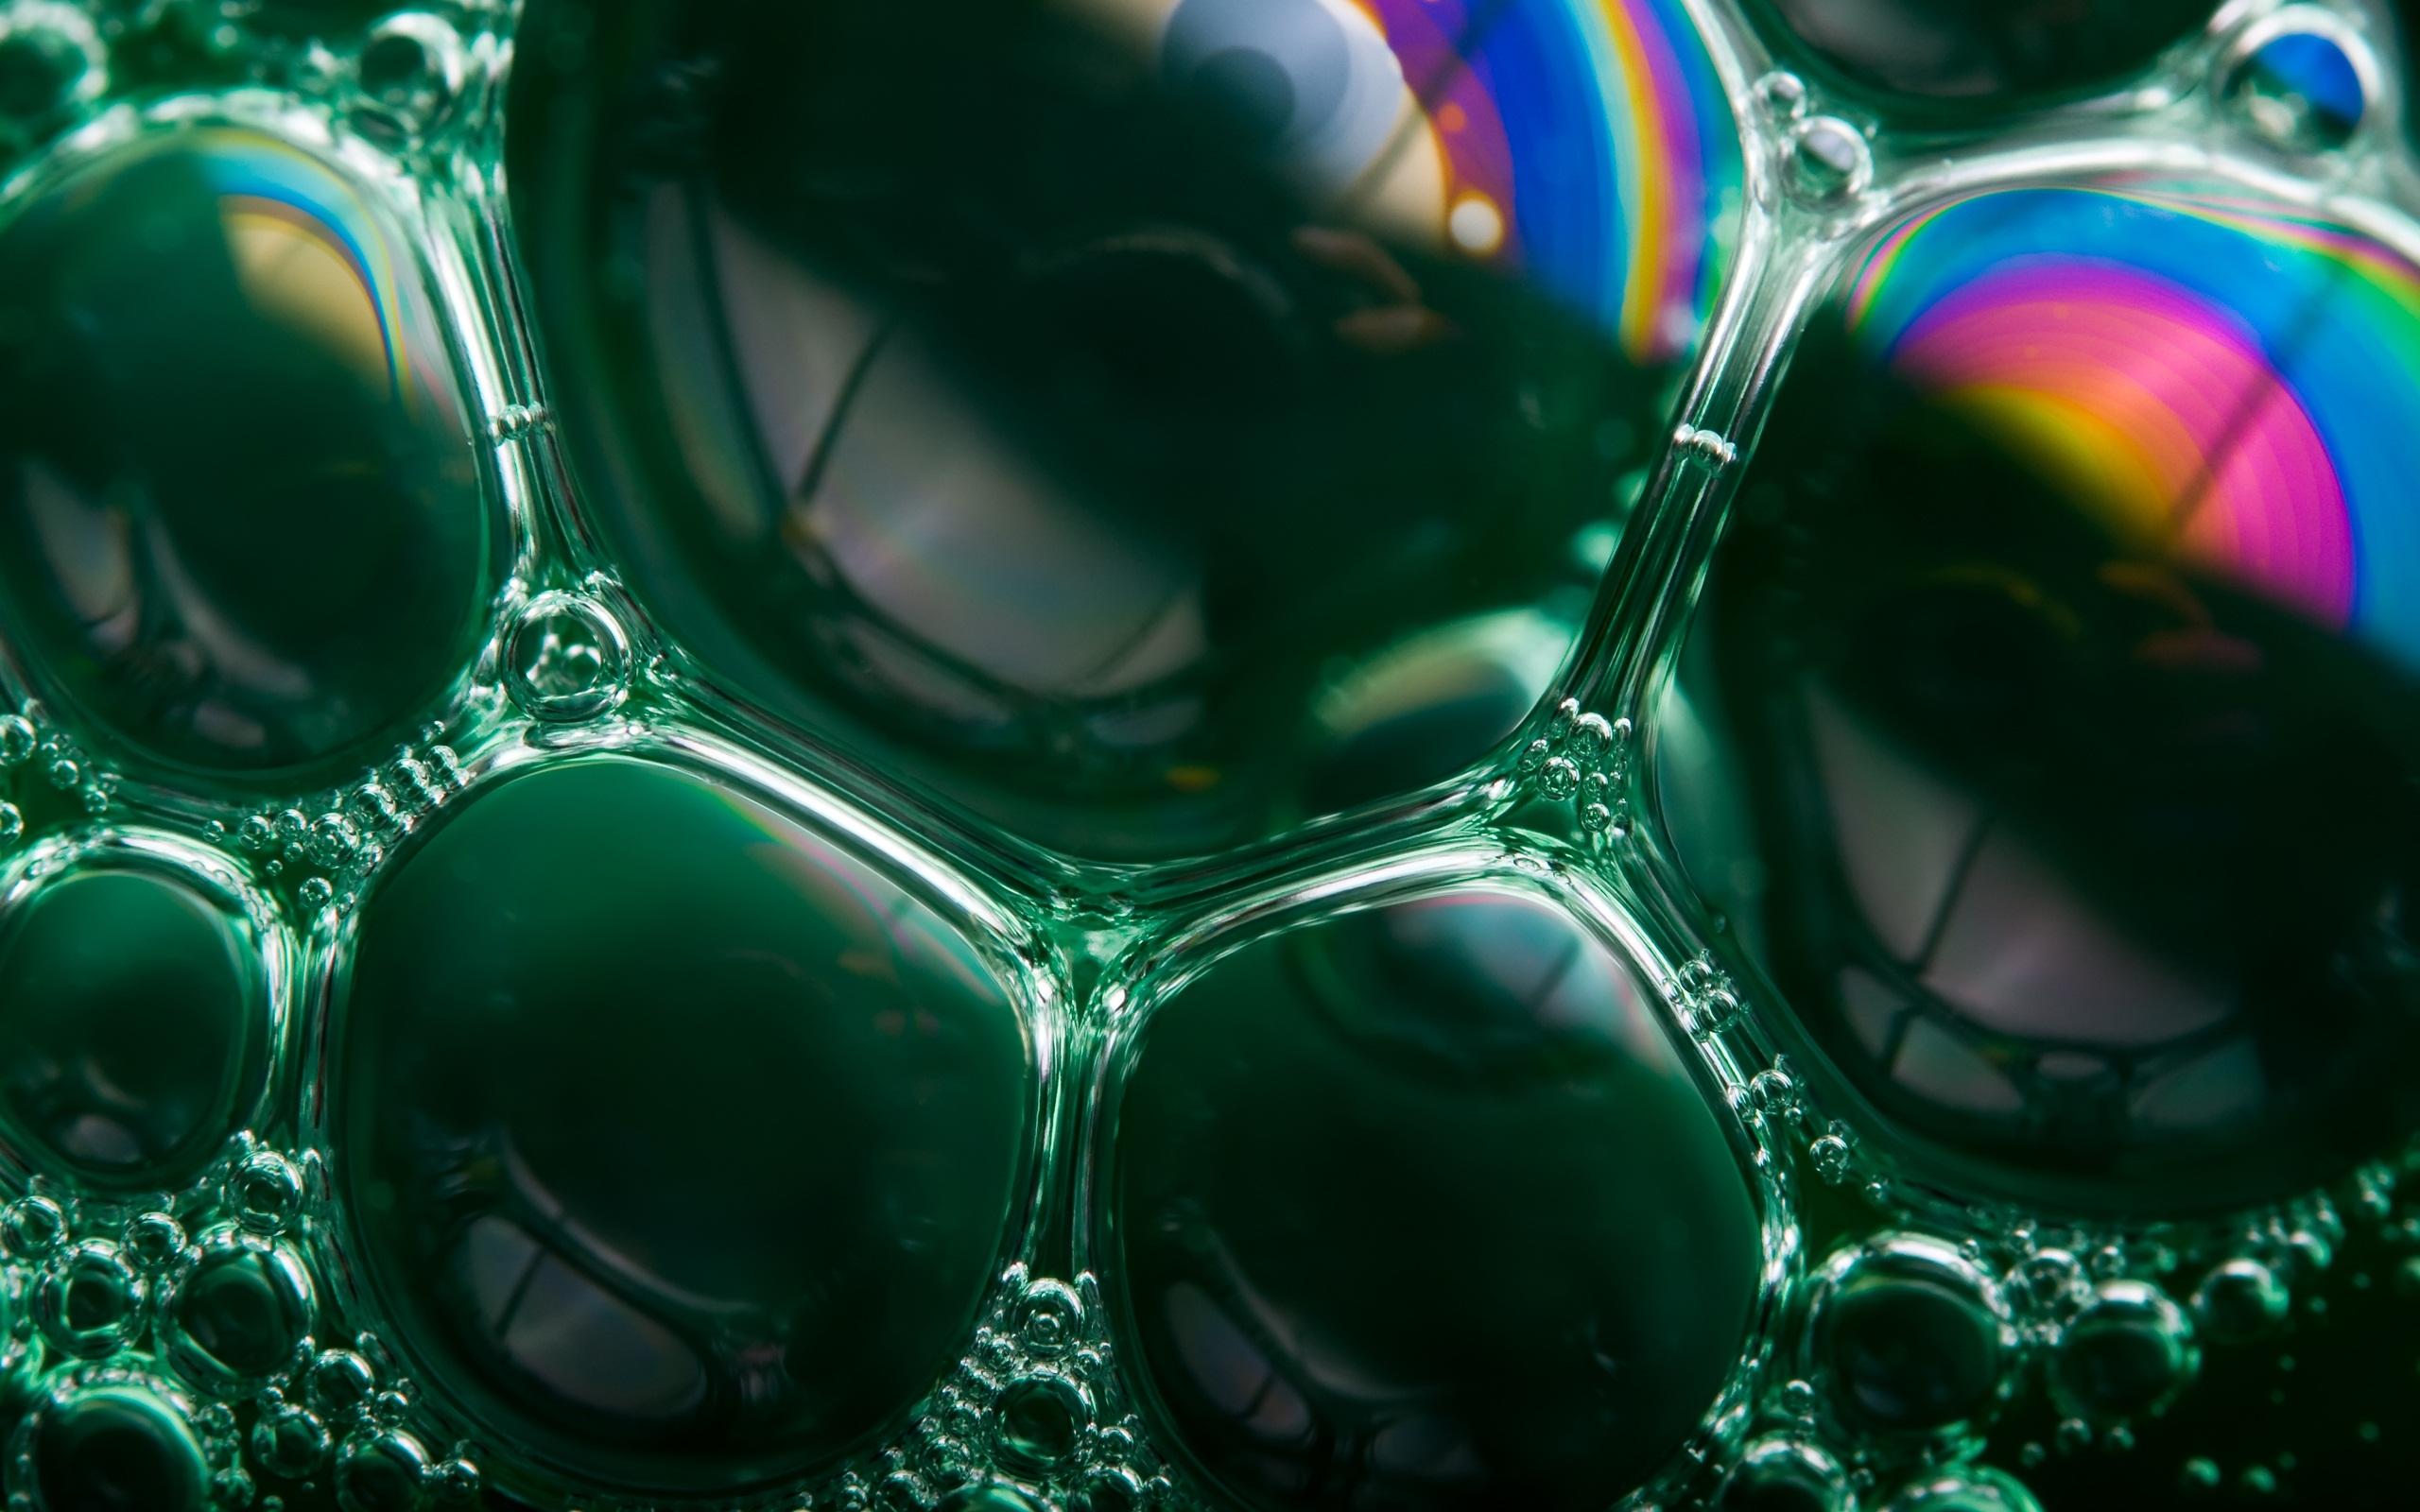 1024x640 Soap Bubbles 1152x720 Soap Bubbles 1280x800 Soap Bubbles 2560x1600